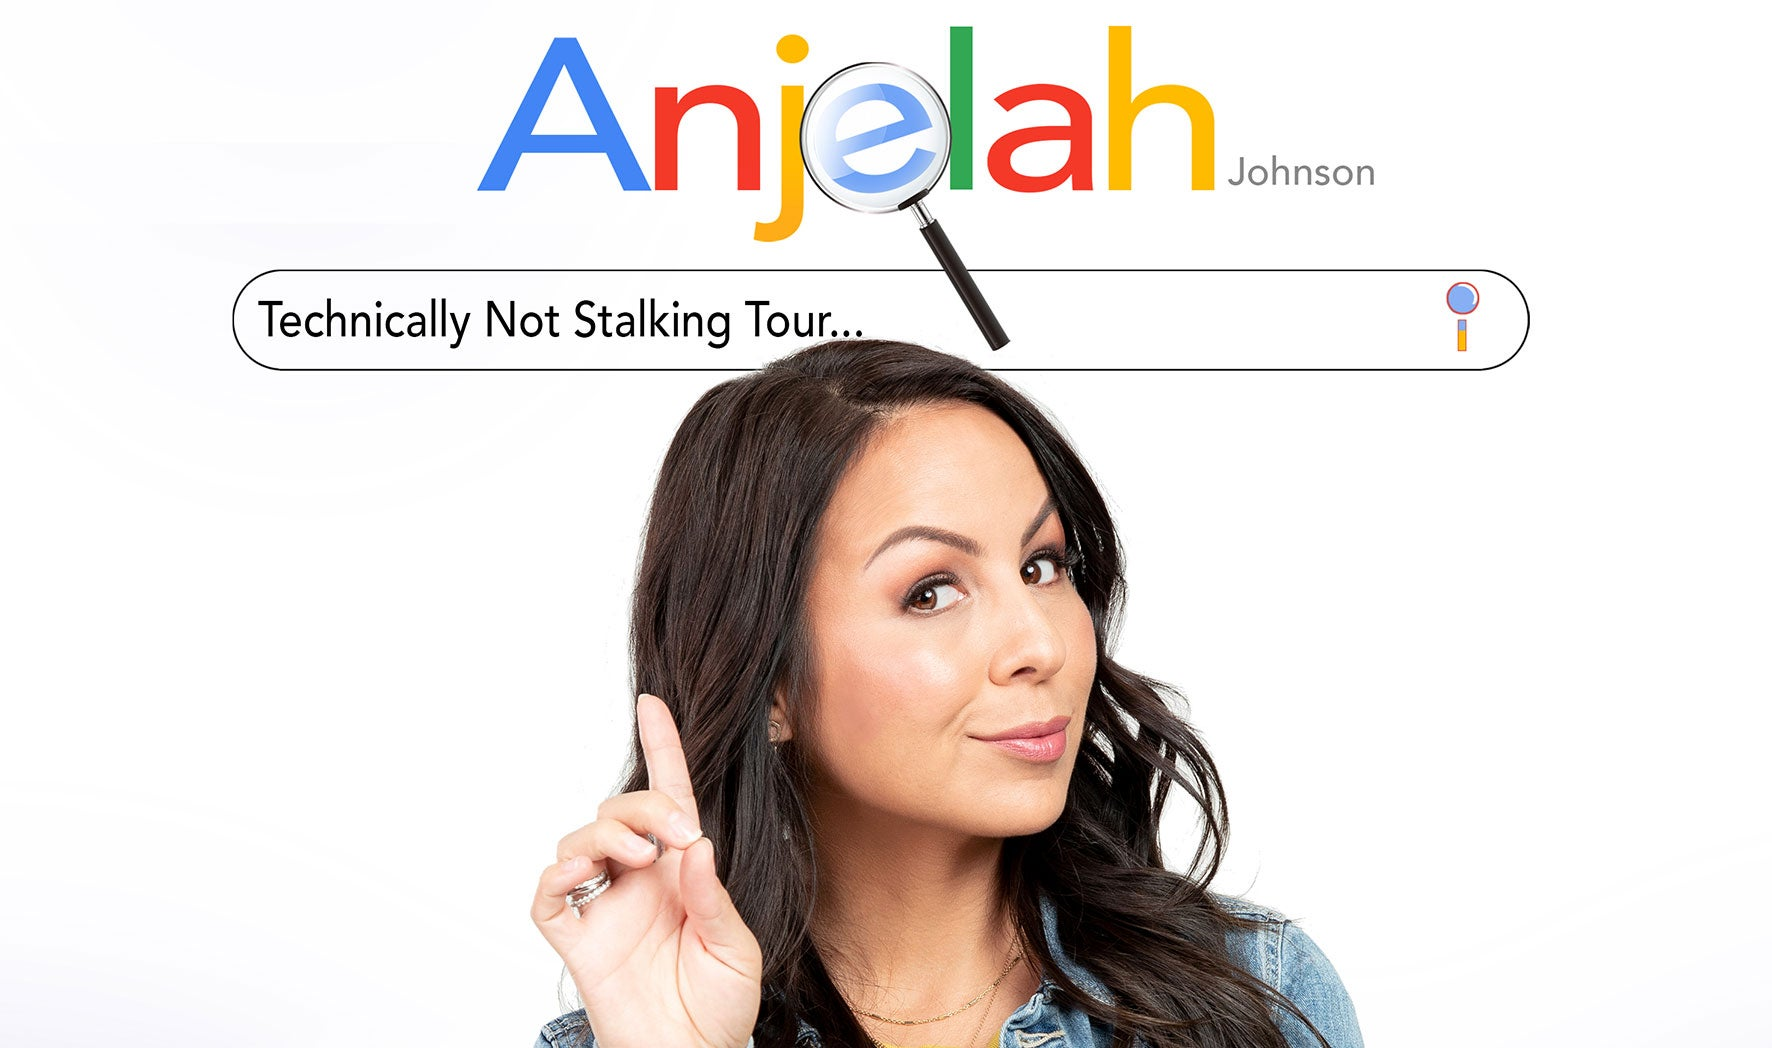 Anjelah Johnson